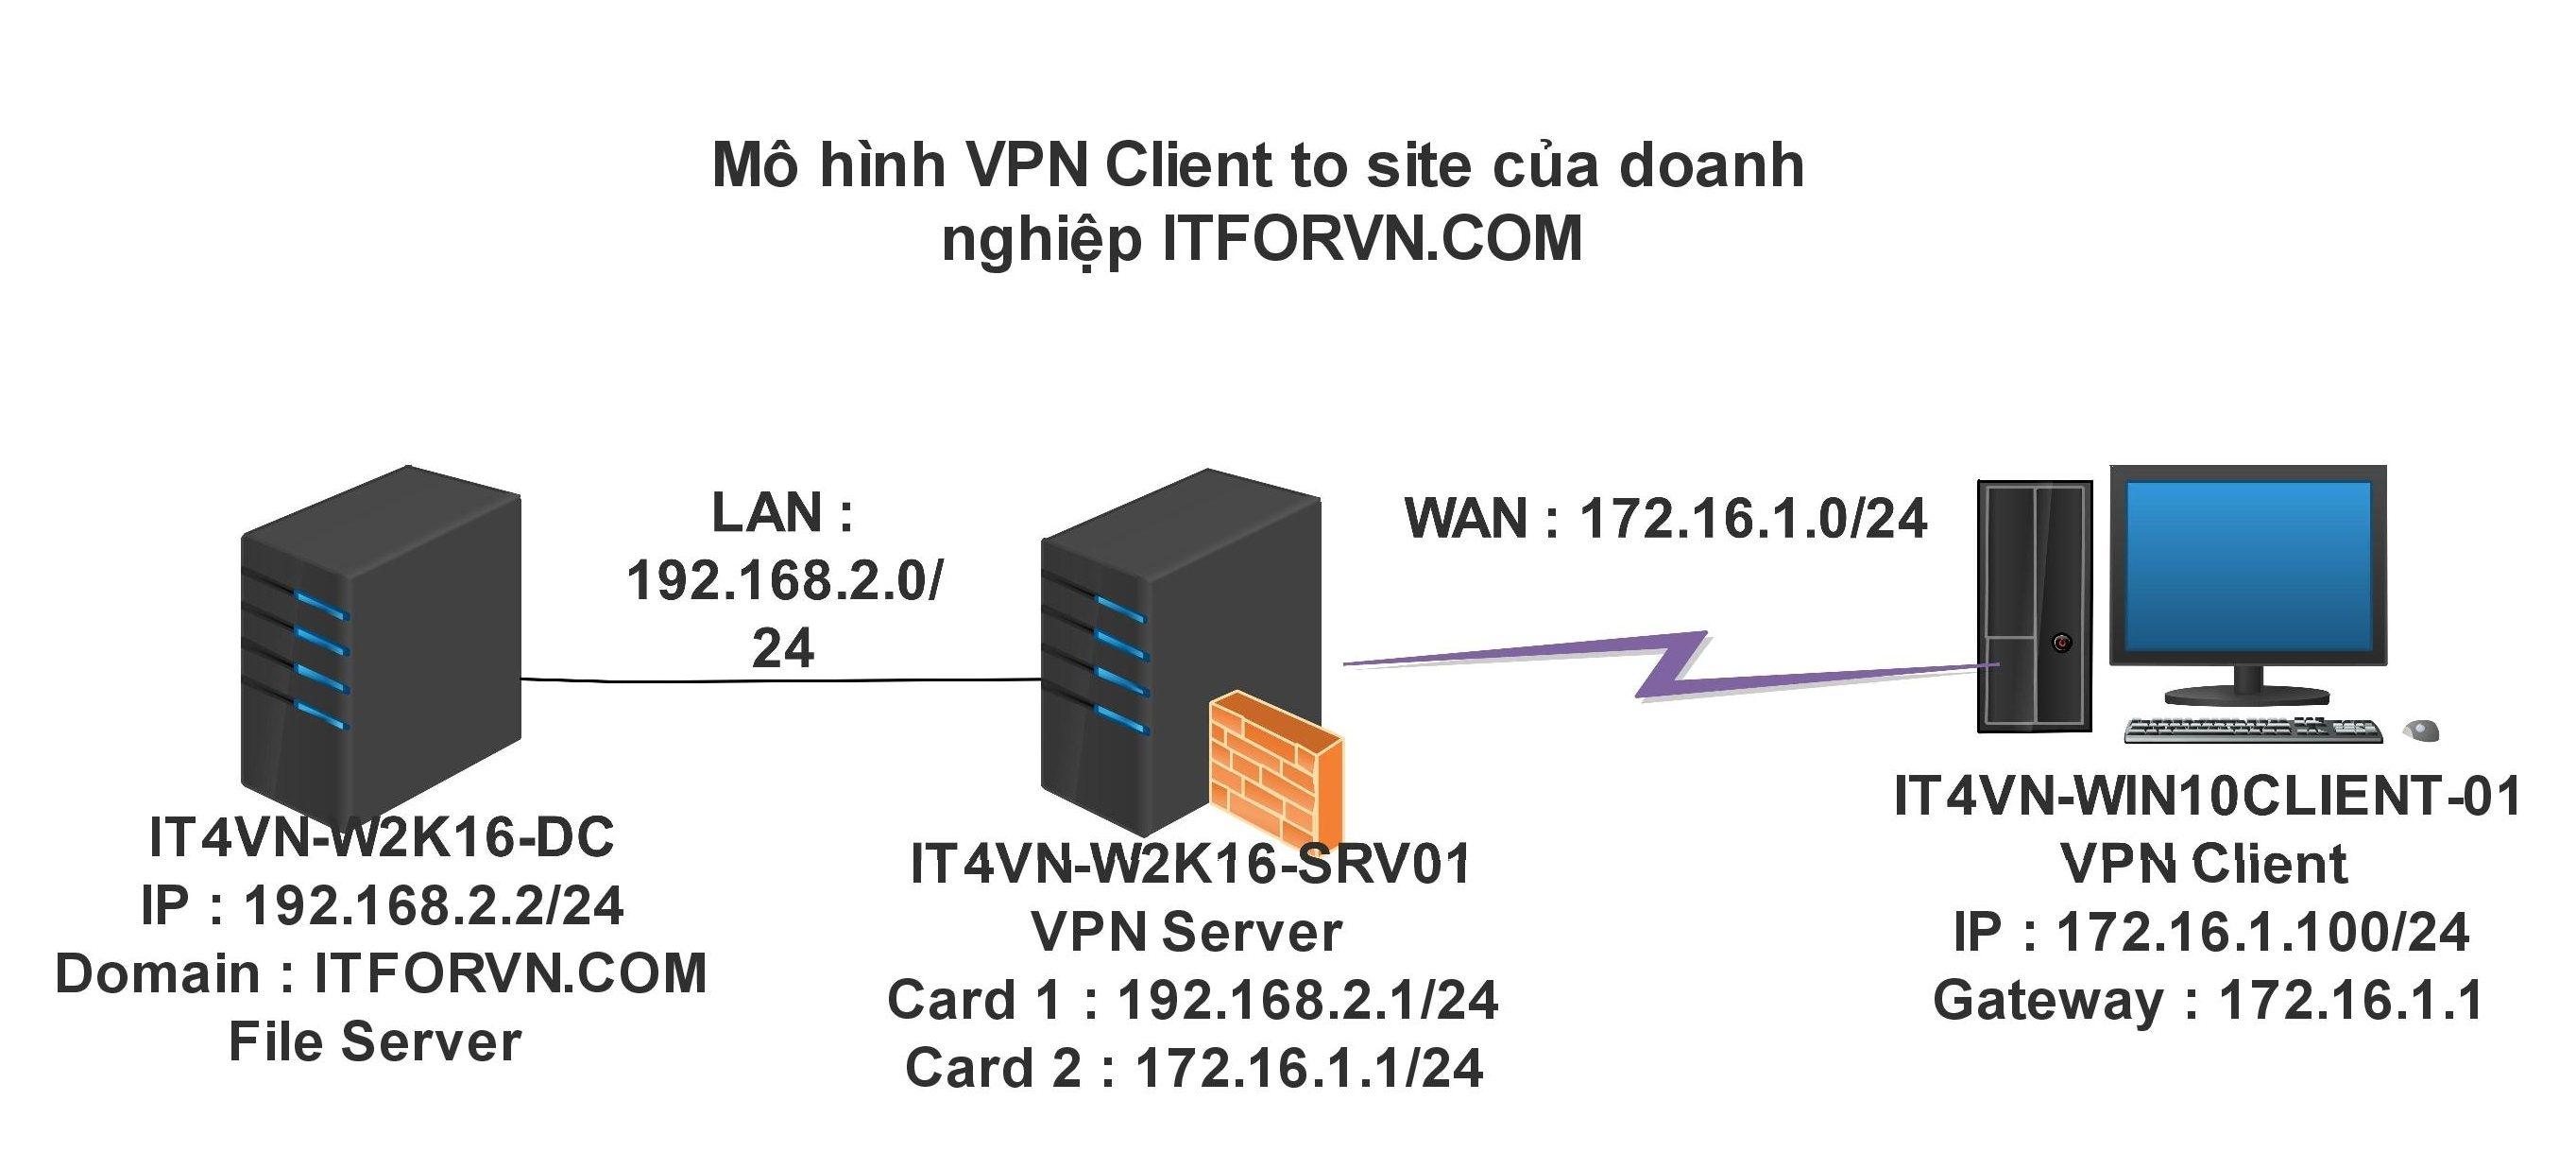 ITFORVN.COM document1-page-001-3-e1496183872210 [Tự học MCSA MCSE 2016]-Lab 16-Cấu hình VPN Server với Client to site trên Windows Server 2016 Windows Server vpn client to site virtual private network mcsa 2016 cau hinh vpn server 2016